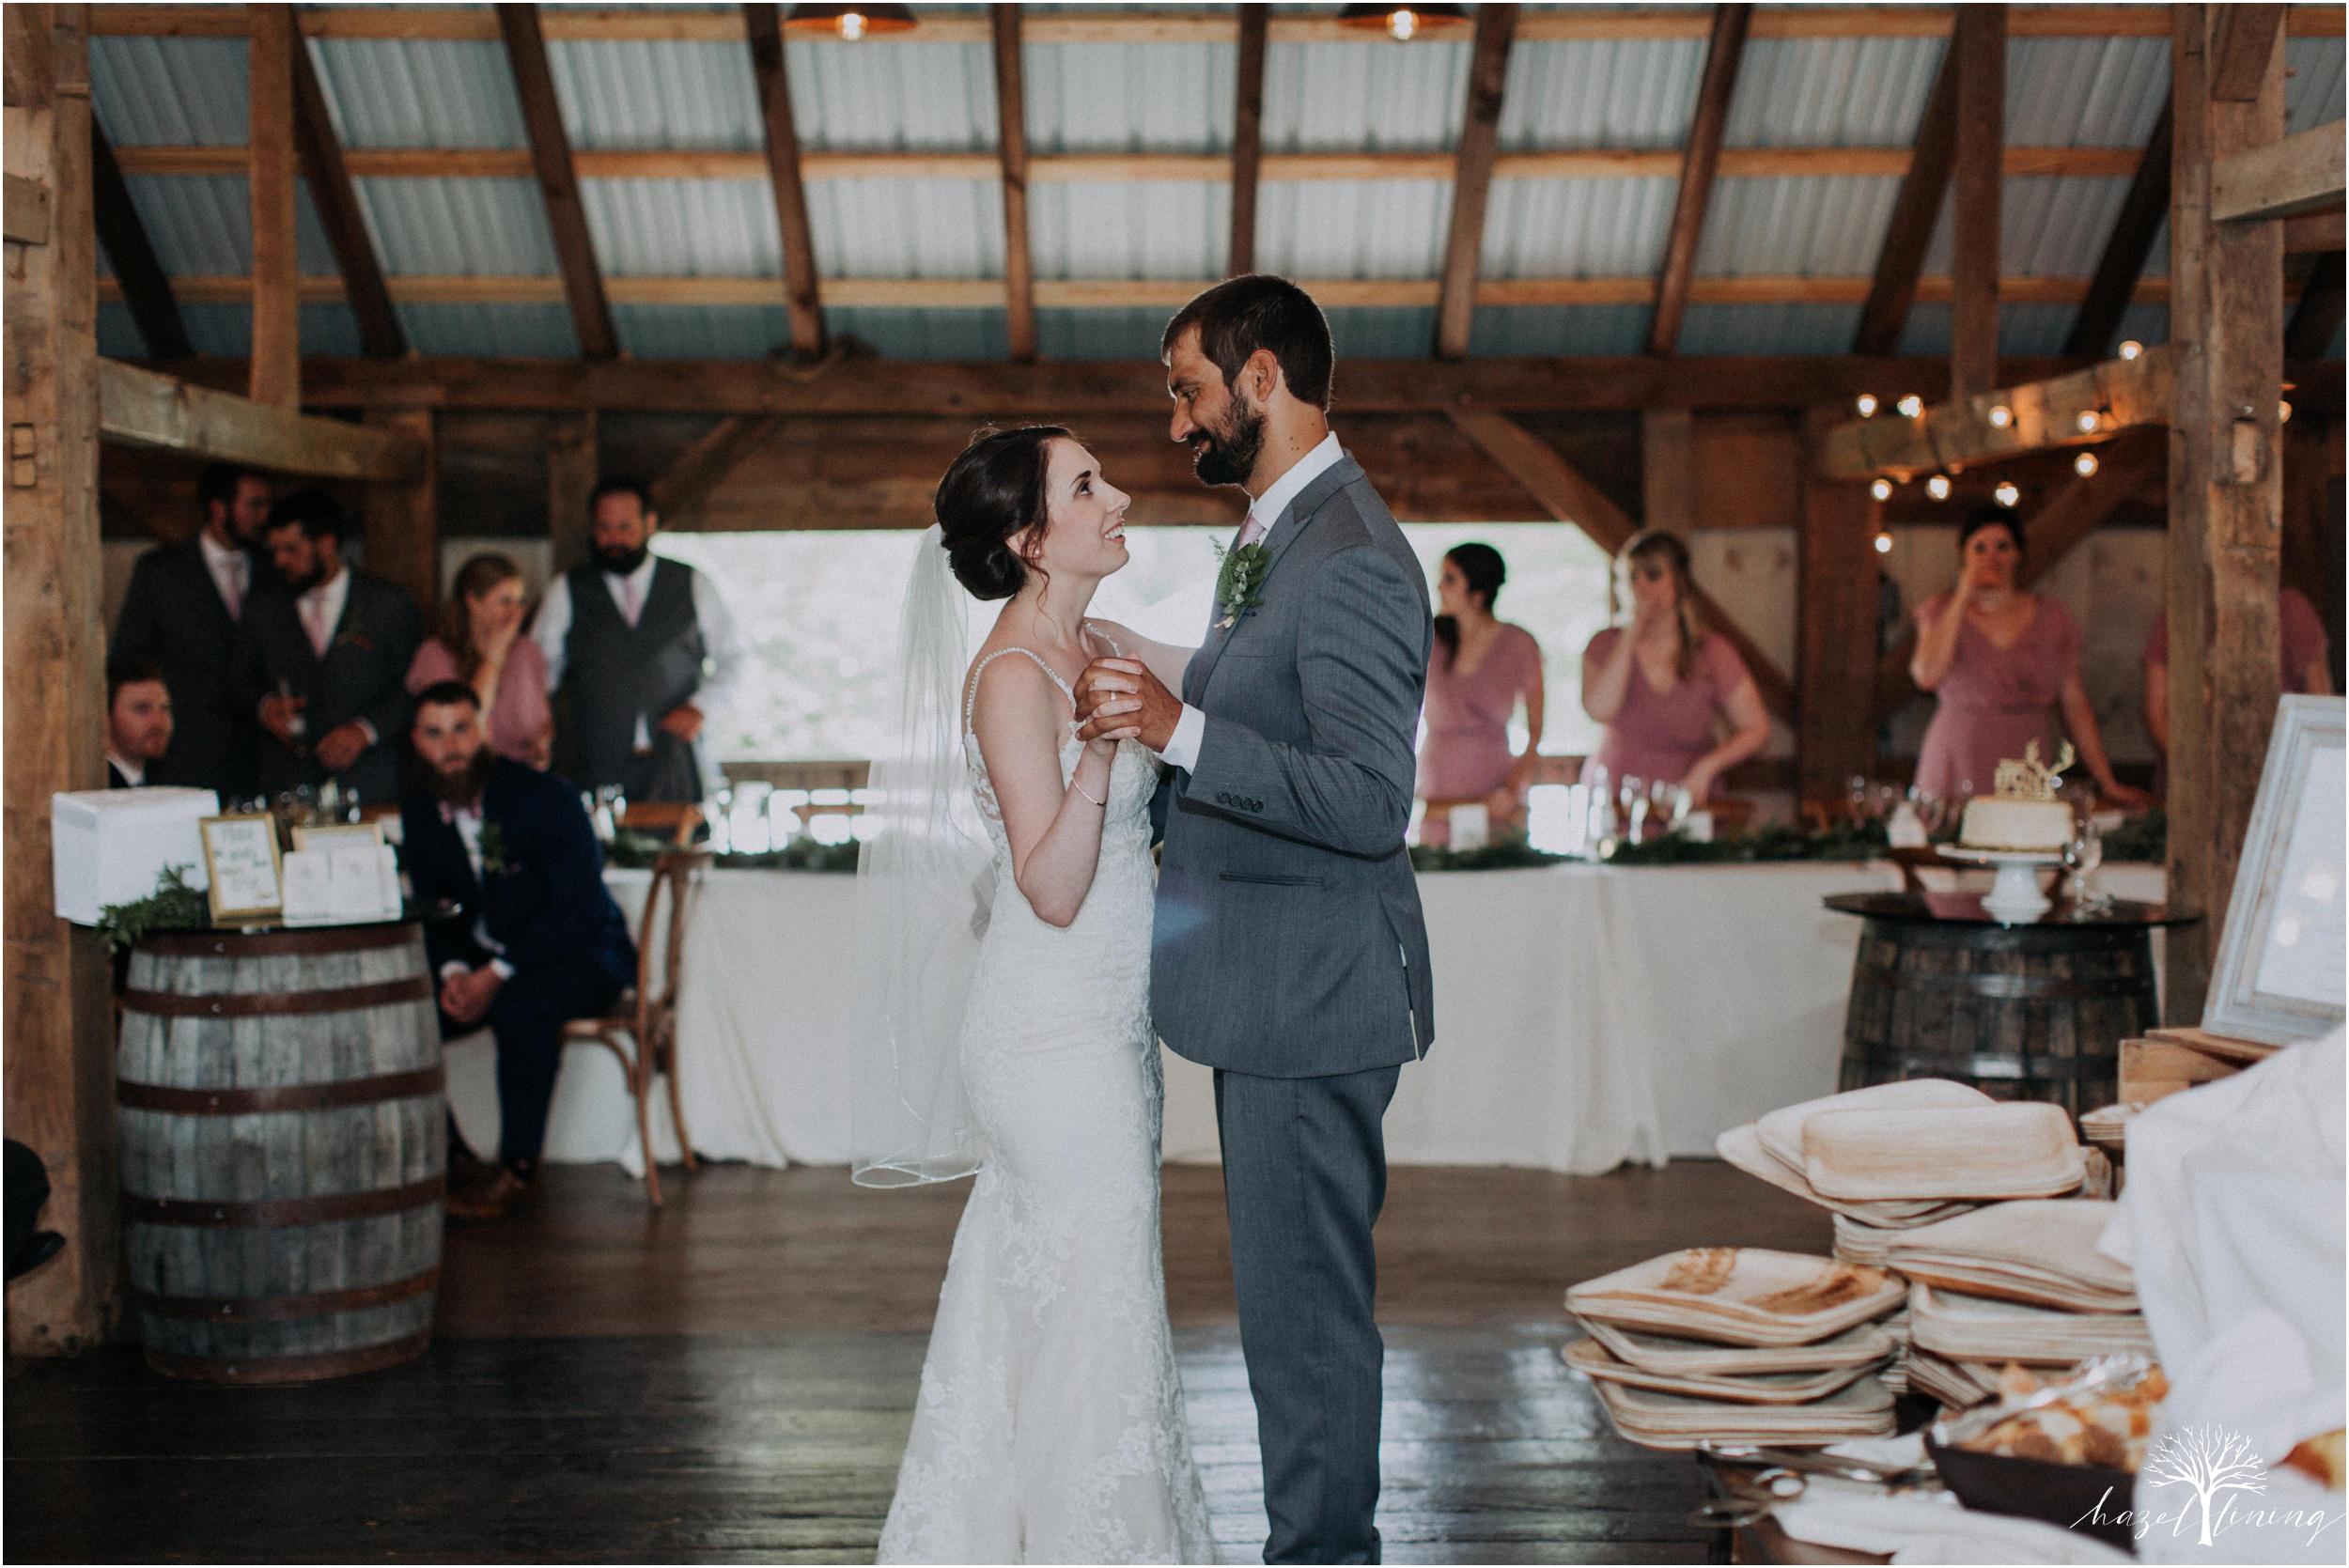 hazel-lining-travel-wedding-elopement-photography-lisa-landon-shoemaker-the-farm-bakery-and-events-bucks-county-quakertown-pennsylvania-summer-country-outdoor-farm-wedding_0110.jpg